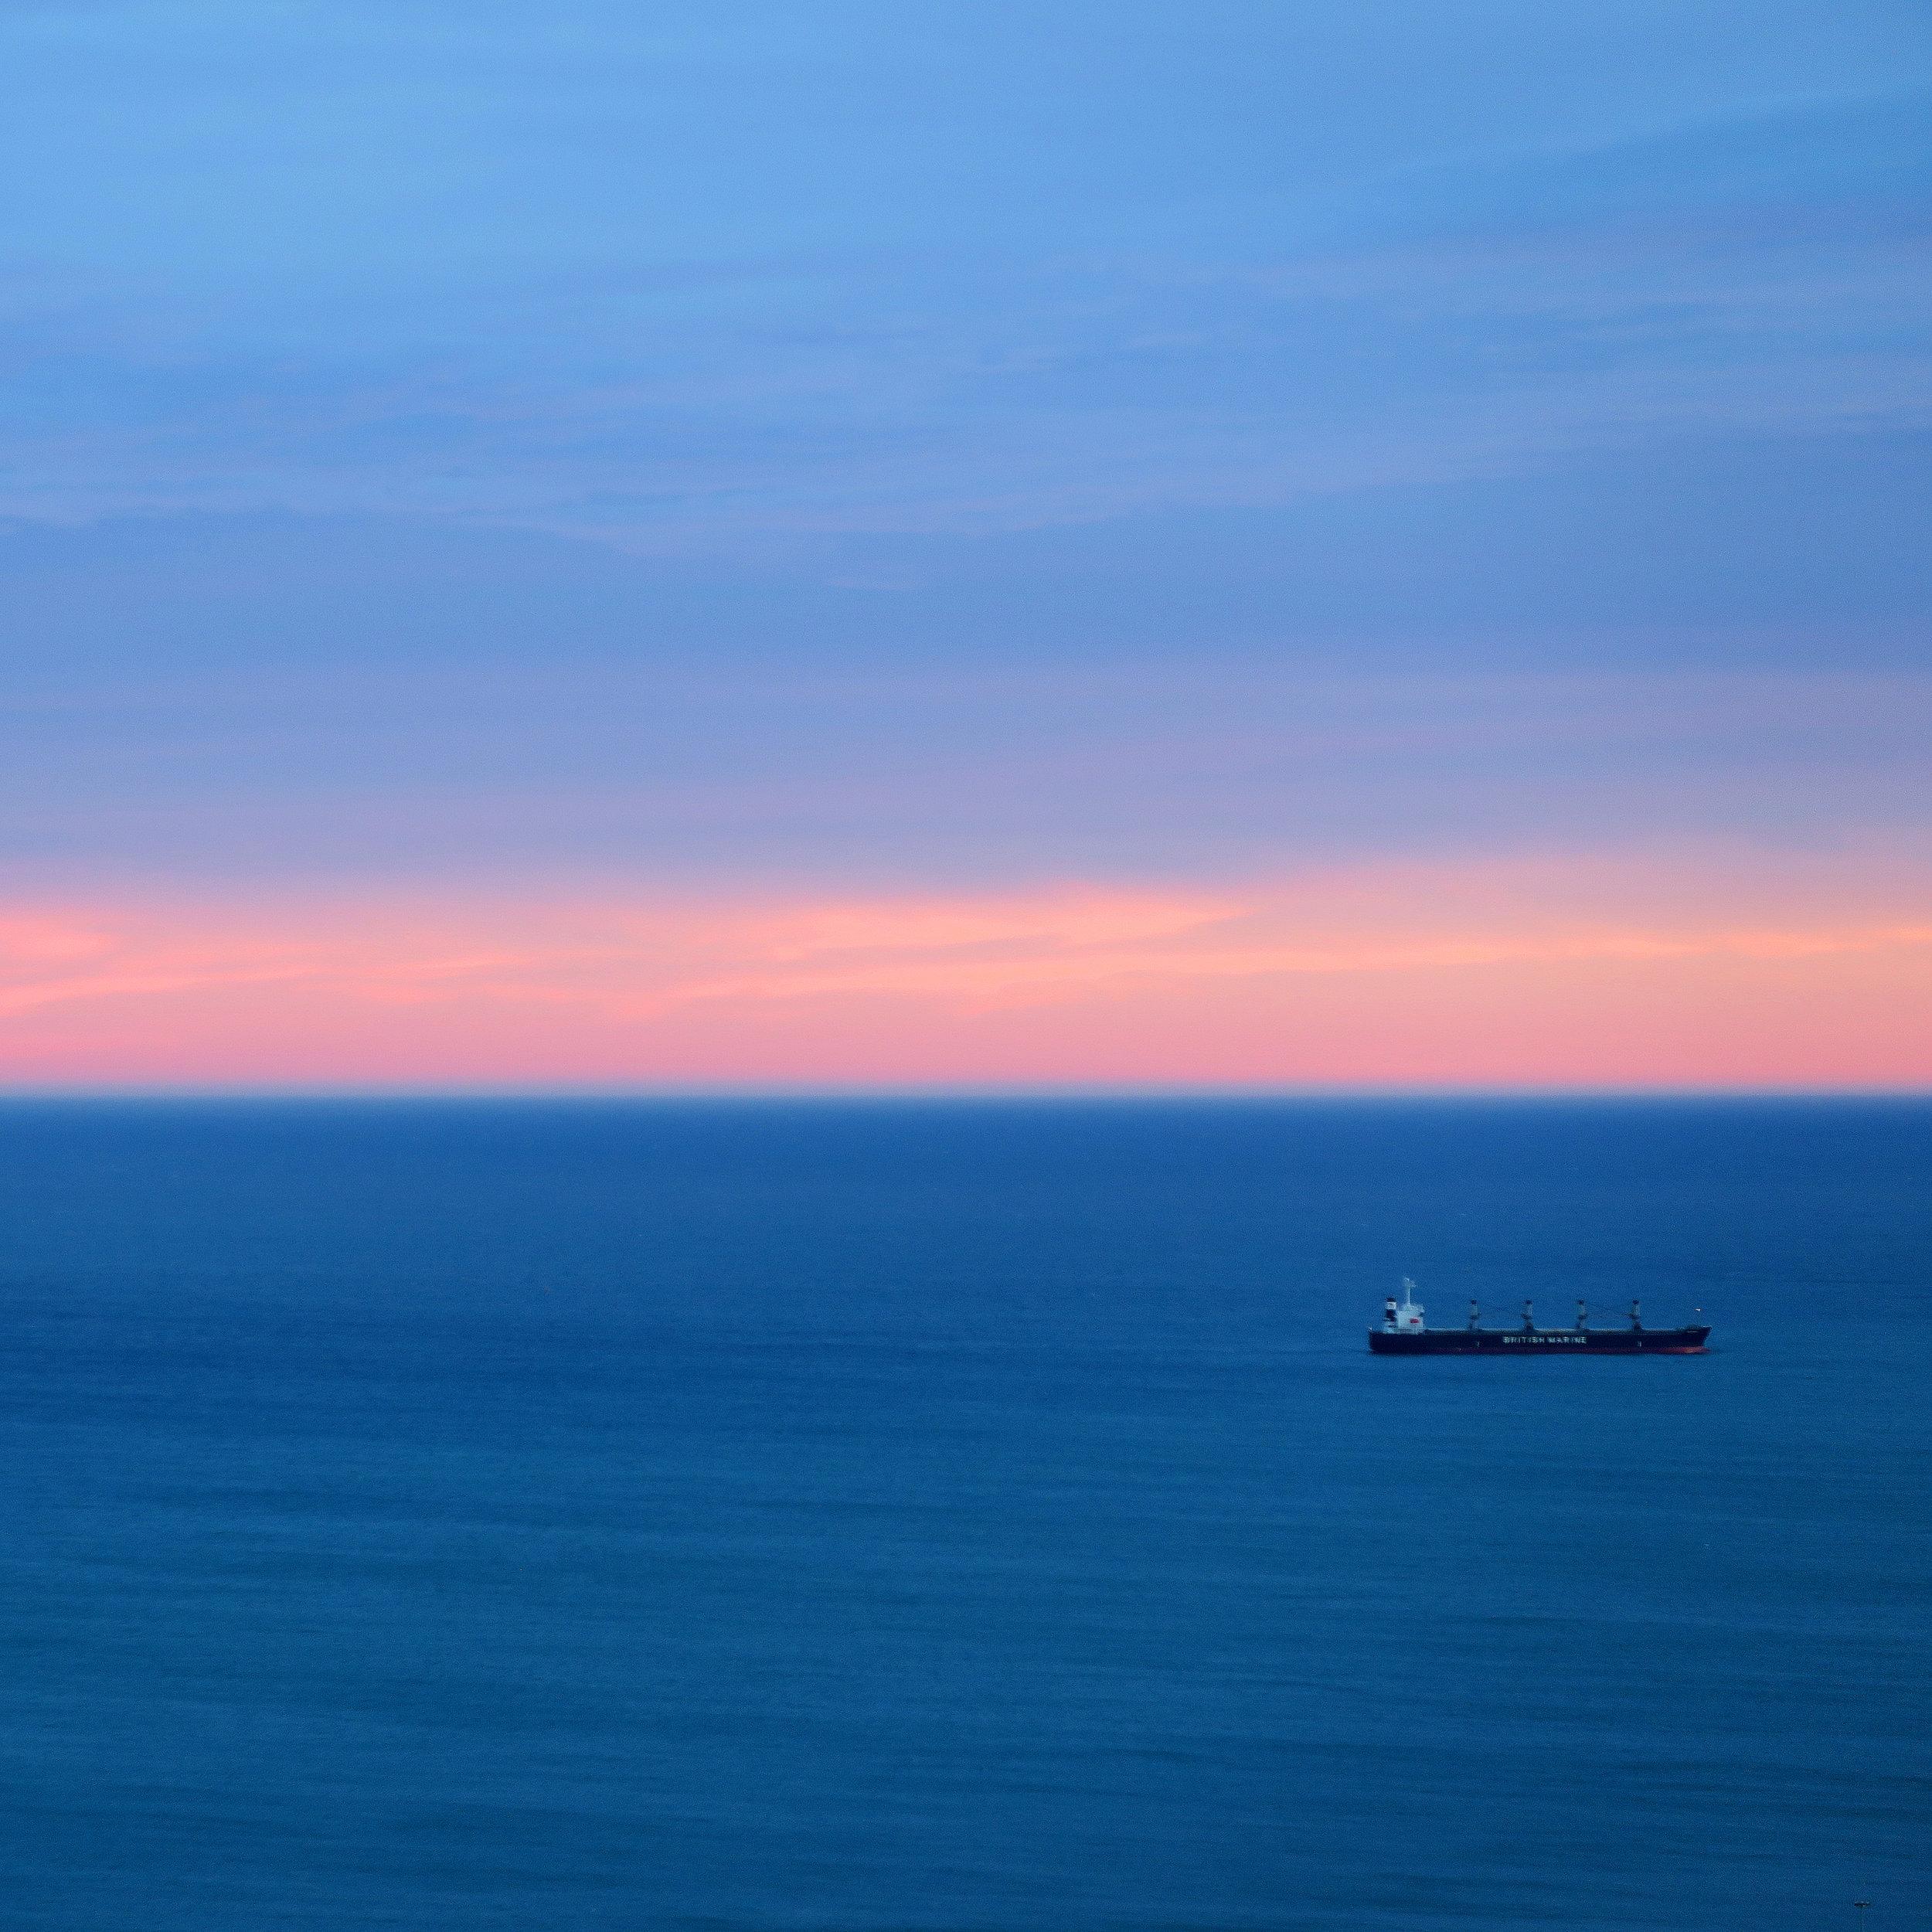 BarcelonaShip.jpg